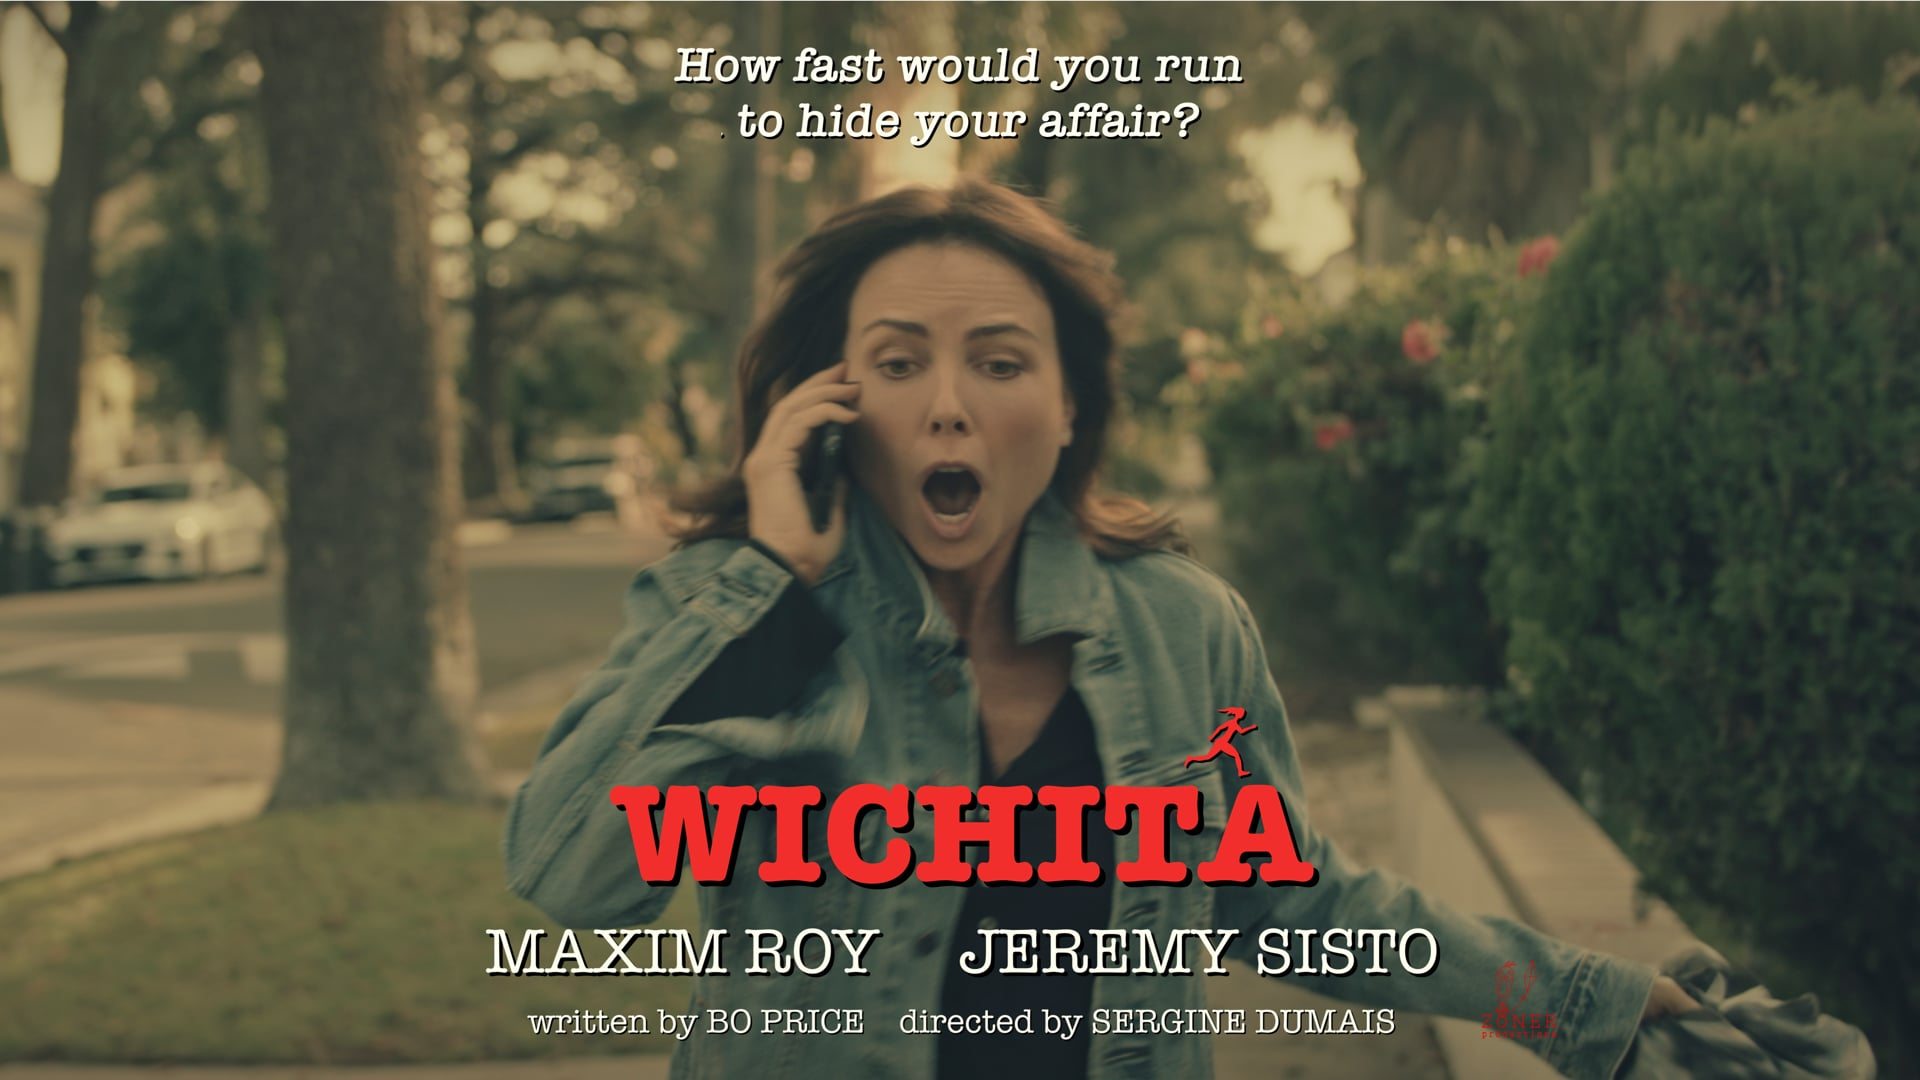 WICHITA -- SHORT FILM TRAILER